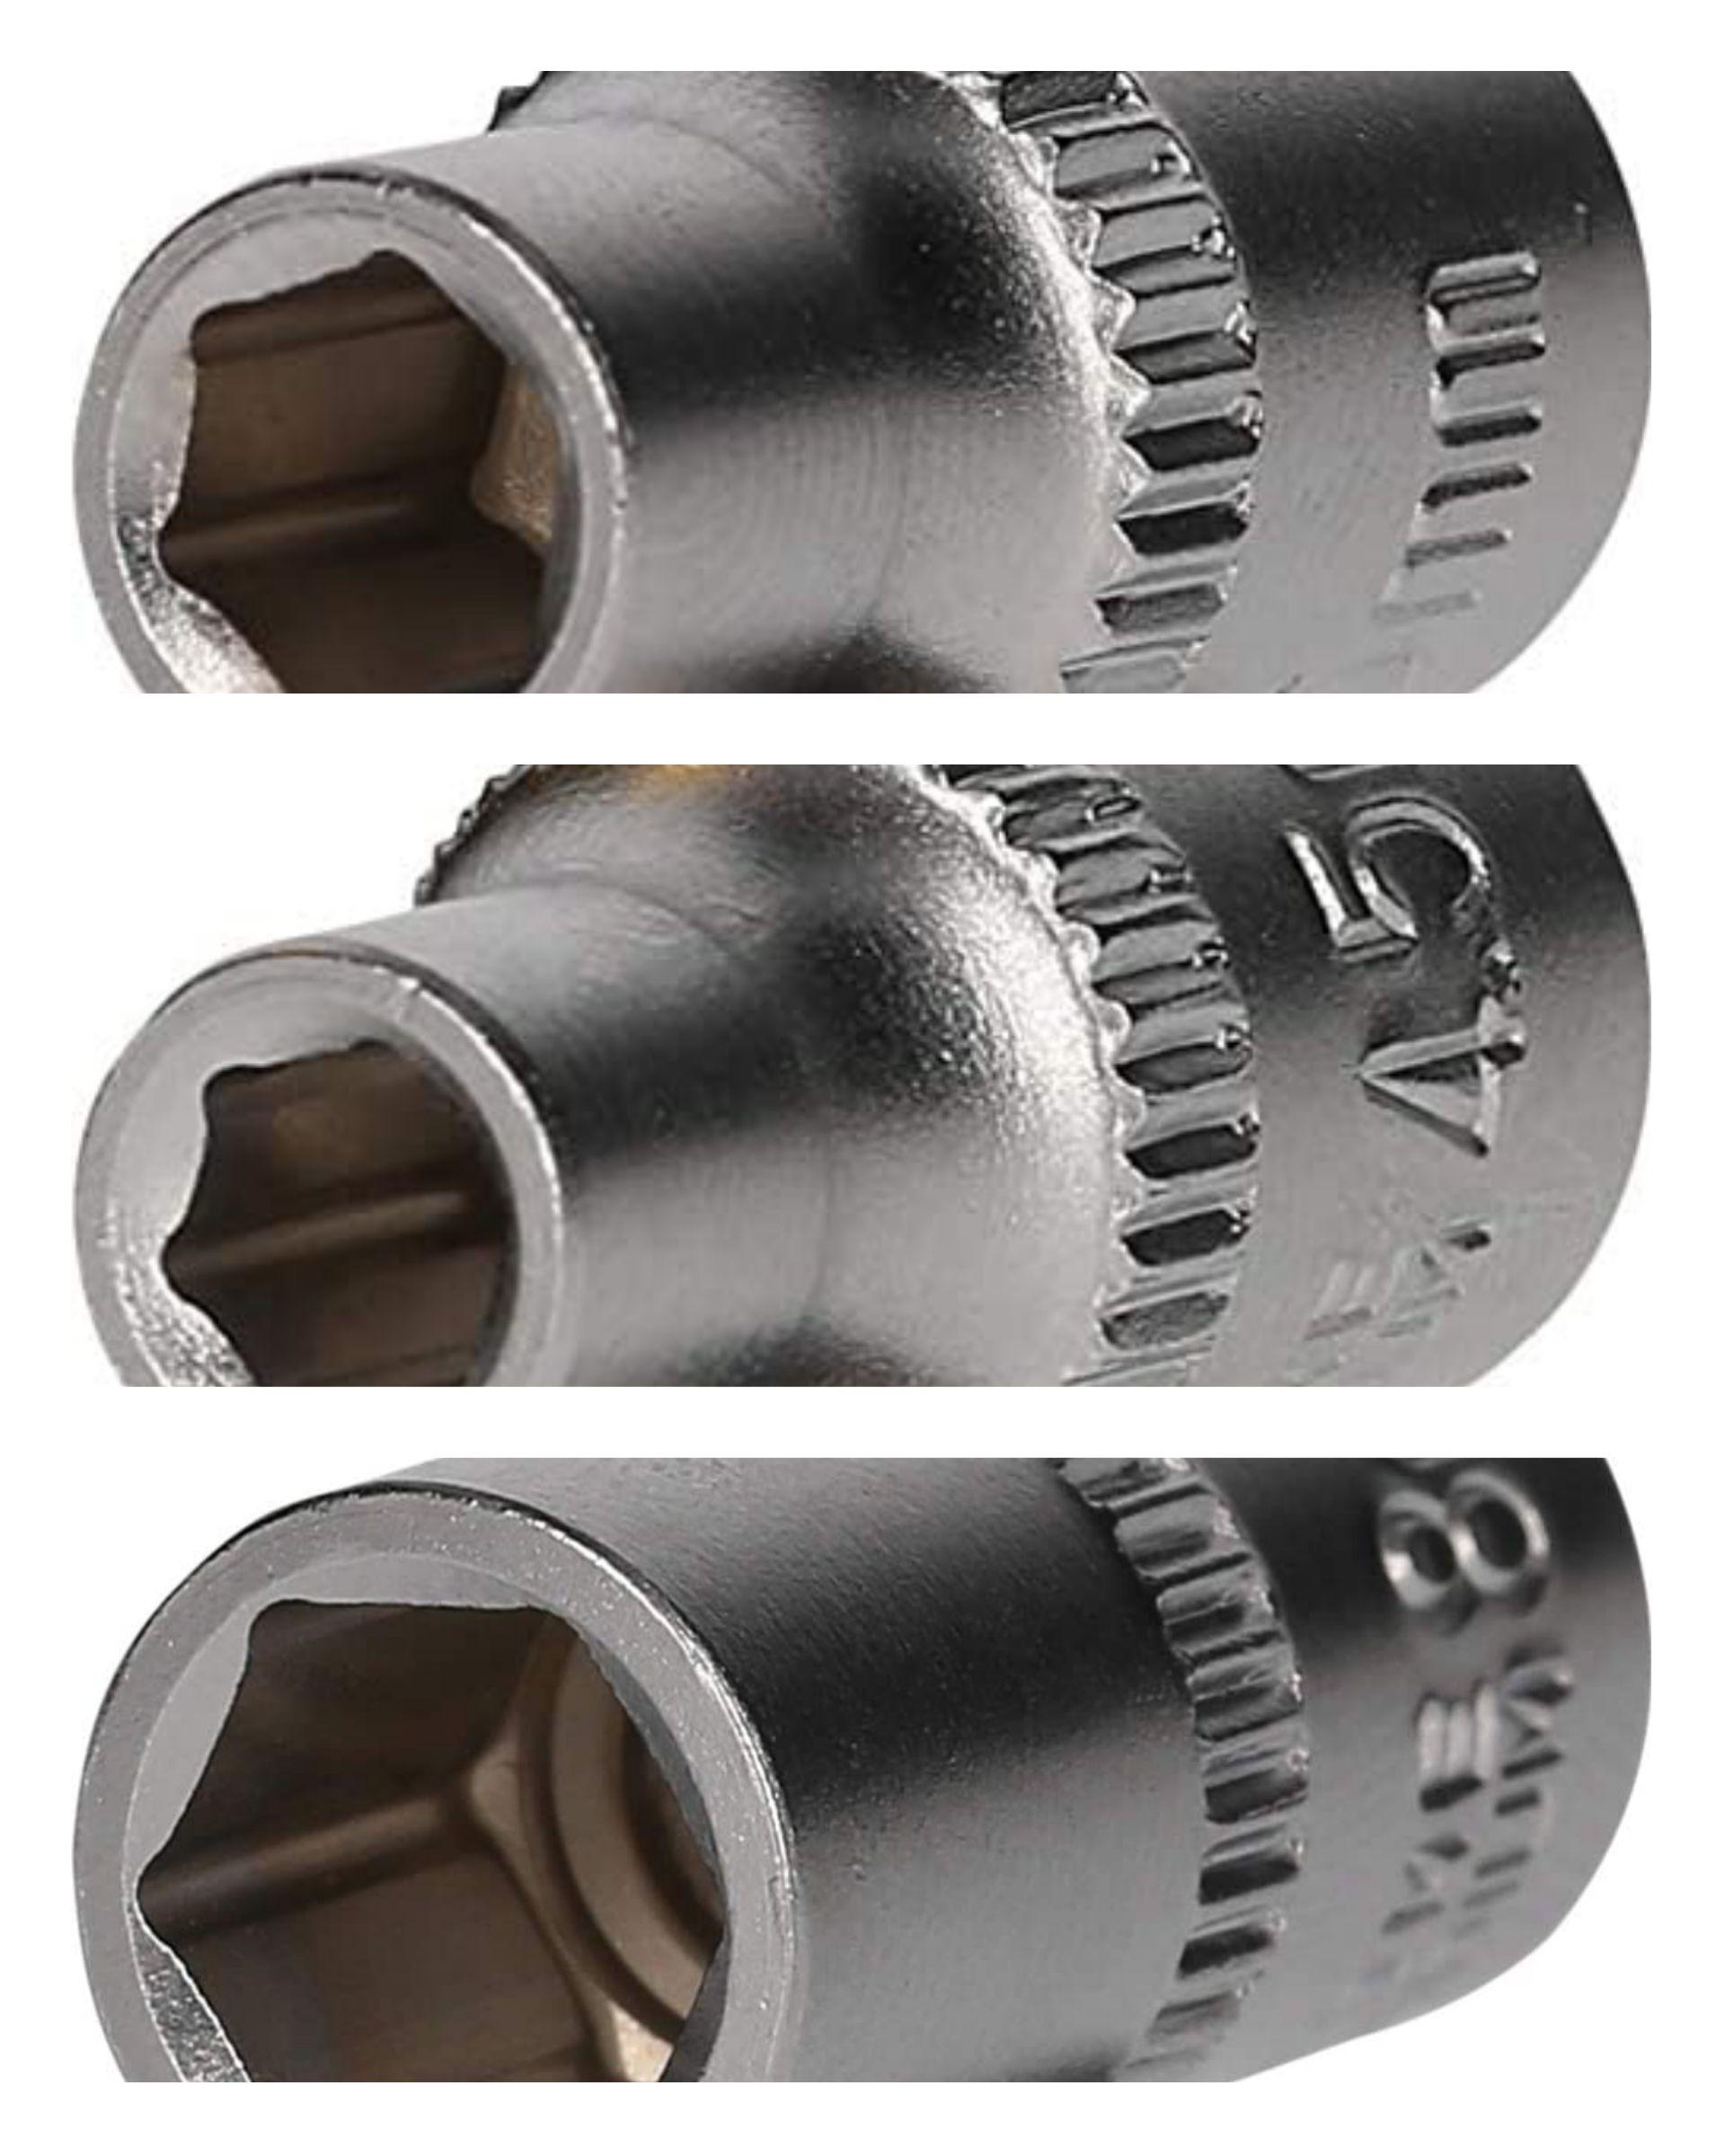 Brilliant Tools 1/4 Inch Socket Spanner, 25 mm, 4.5mm/5.5 mm/8mm Insert 84p (£4.49 p&p non prime) @ Amazon EU (UK Mainland)